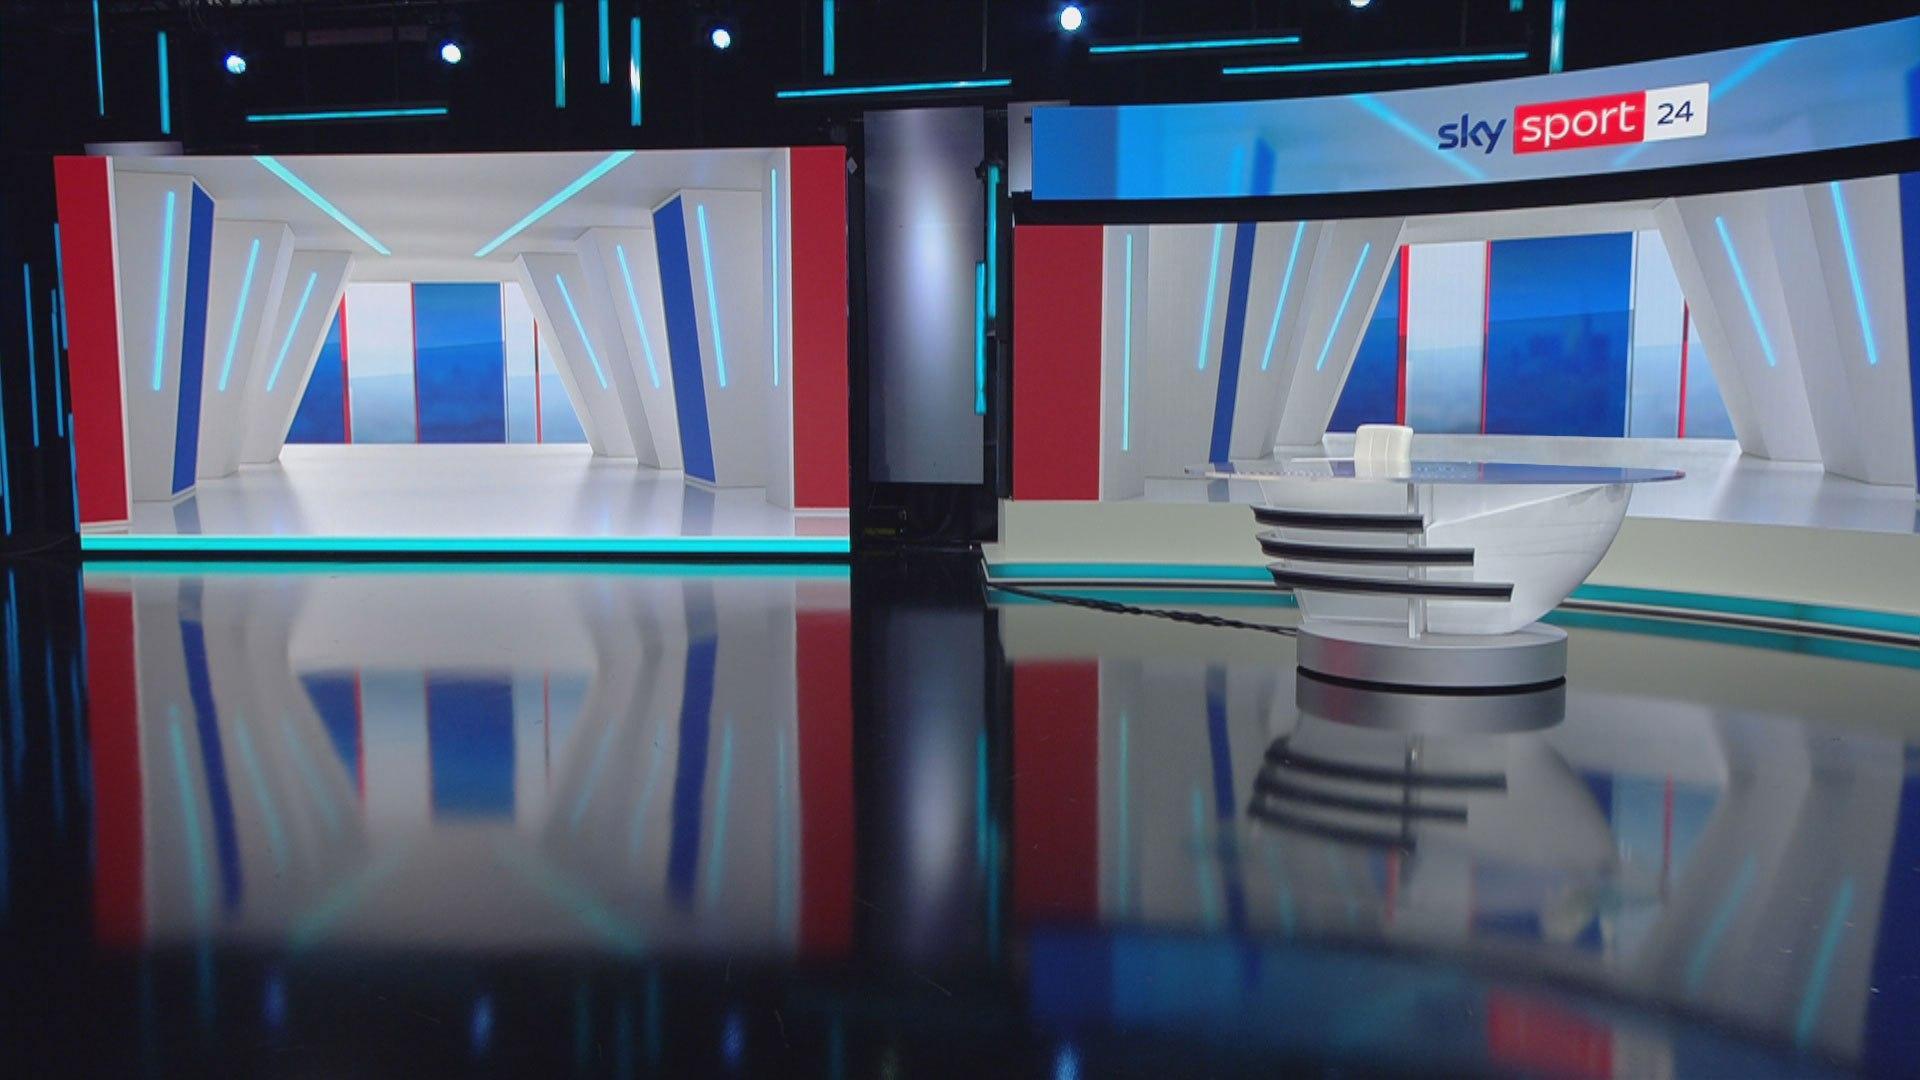 Sky Sport24 Sport 24 Today